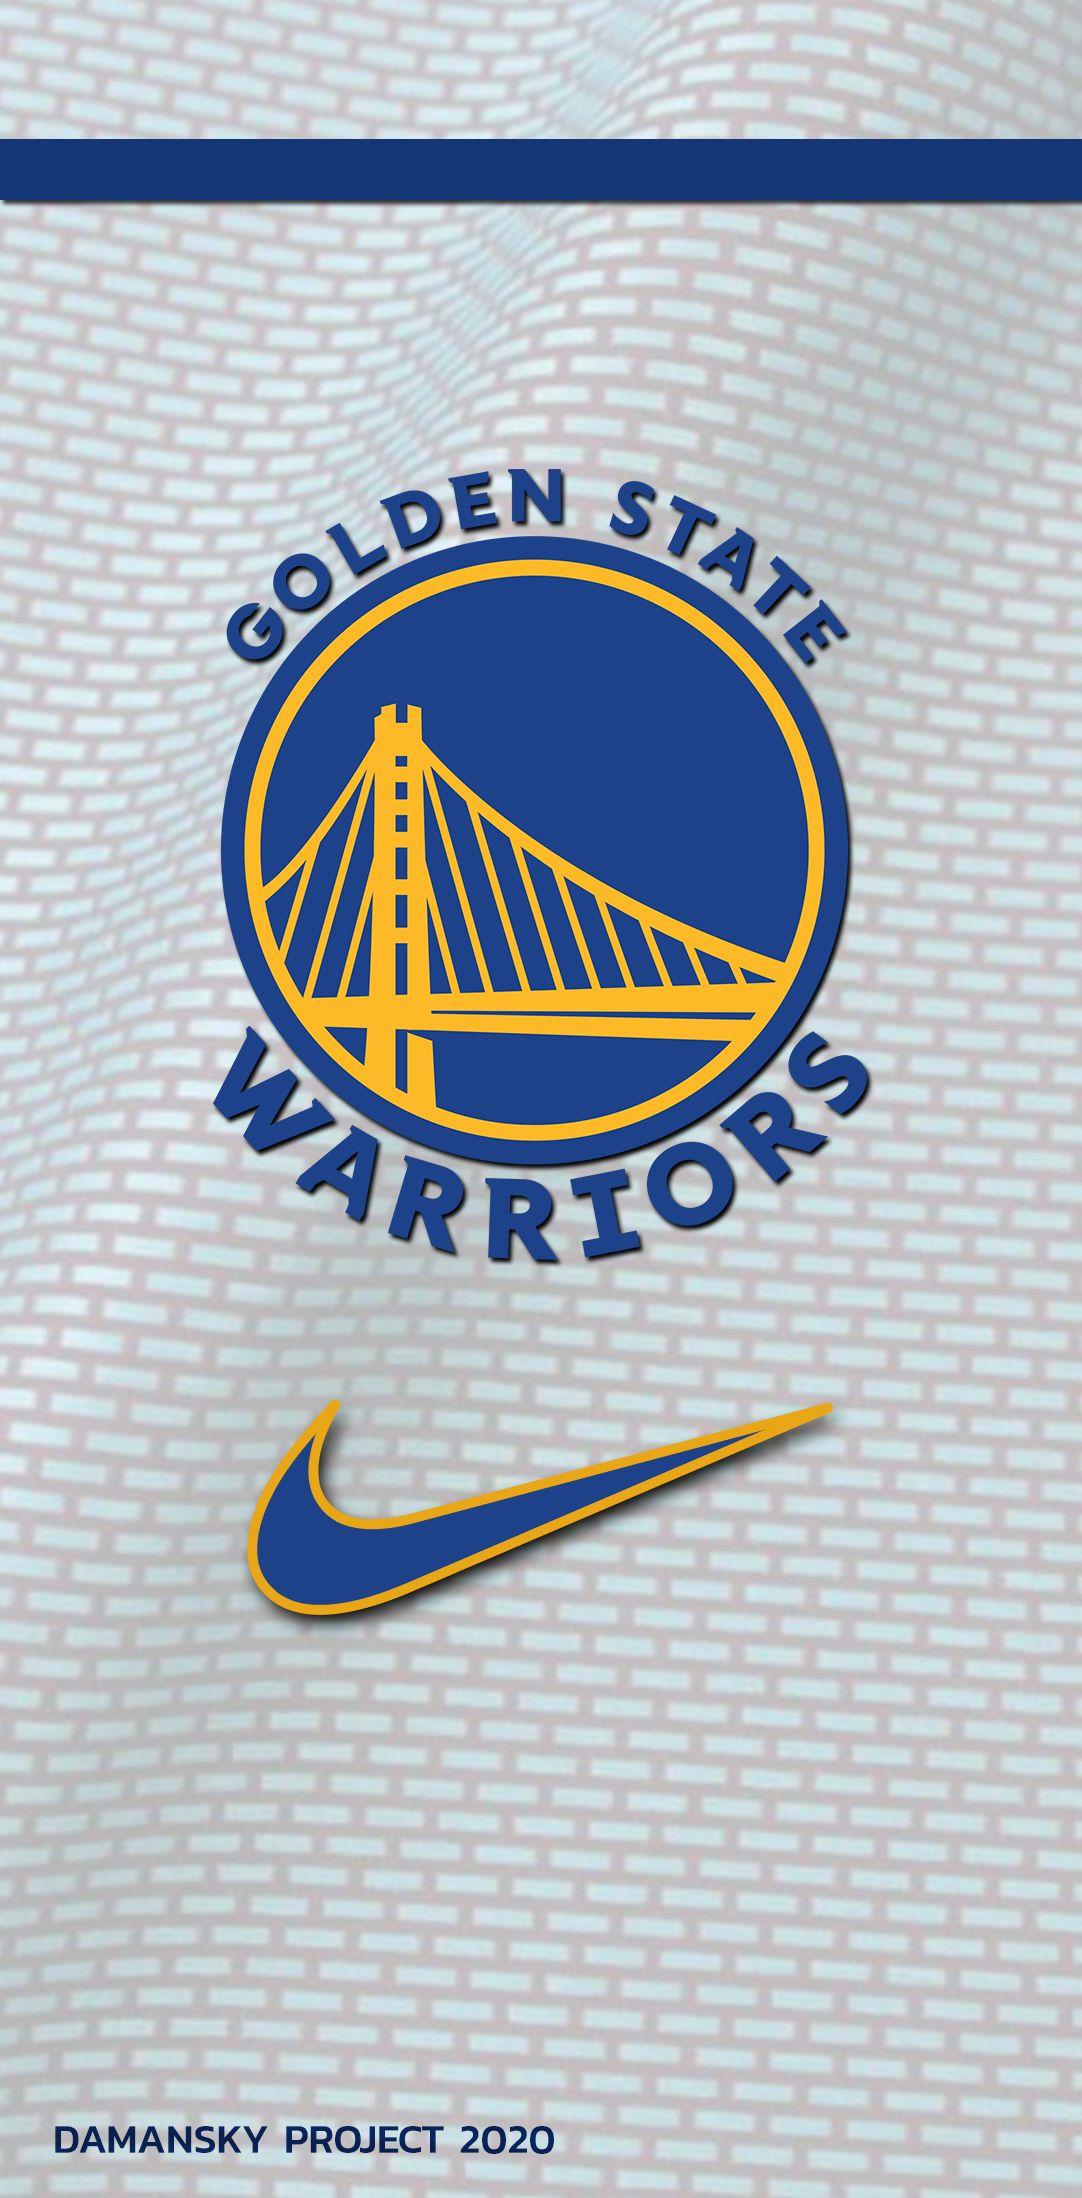 Golden state warriors dragon logo golden dragon post falls facebook